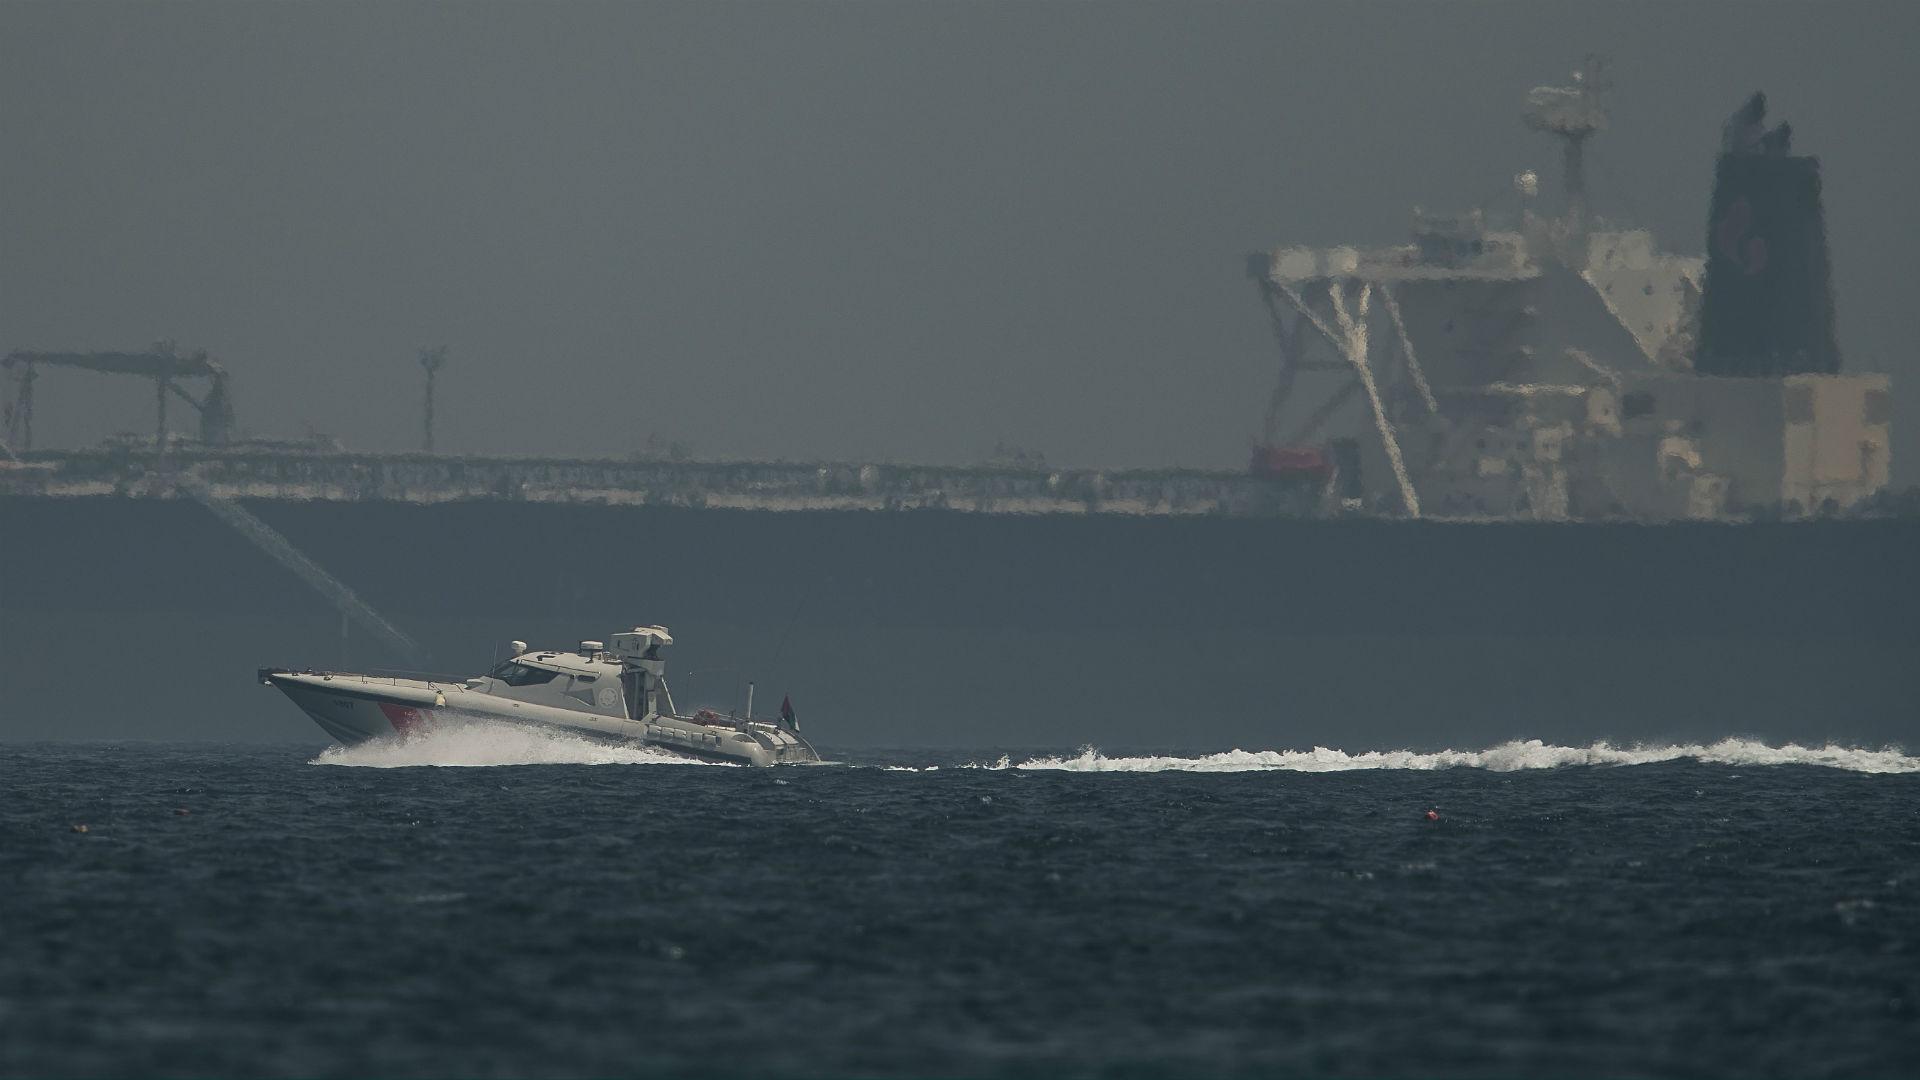 Un navío de la Guardia Costera emiratí pasa junto a un petrolero frente a la costa de Fujairah, Emiratos Árabes Unidos, el lunes 13 de mayo de 2019. (AP Foto/Jon Gambrell)